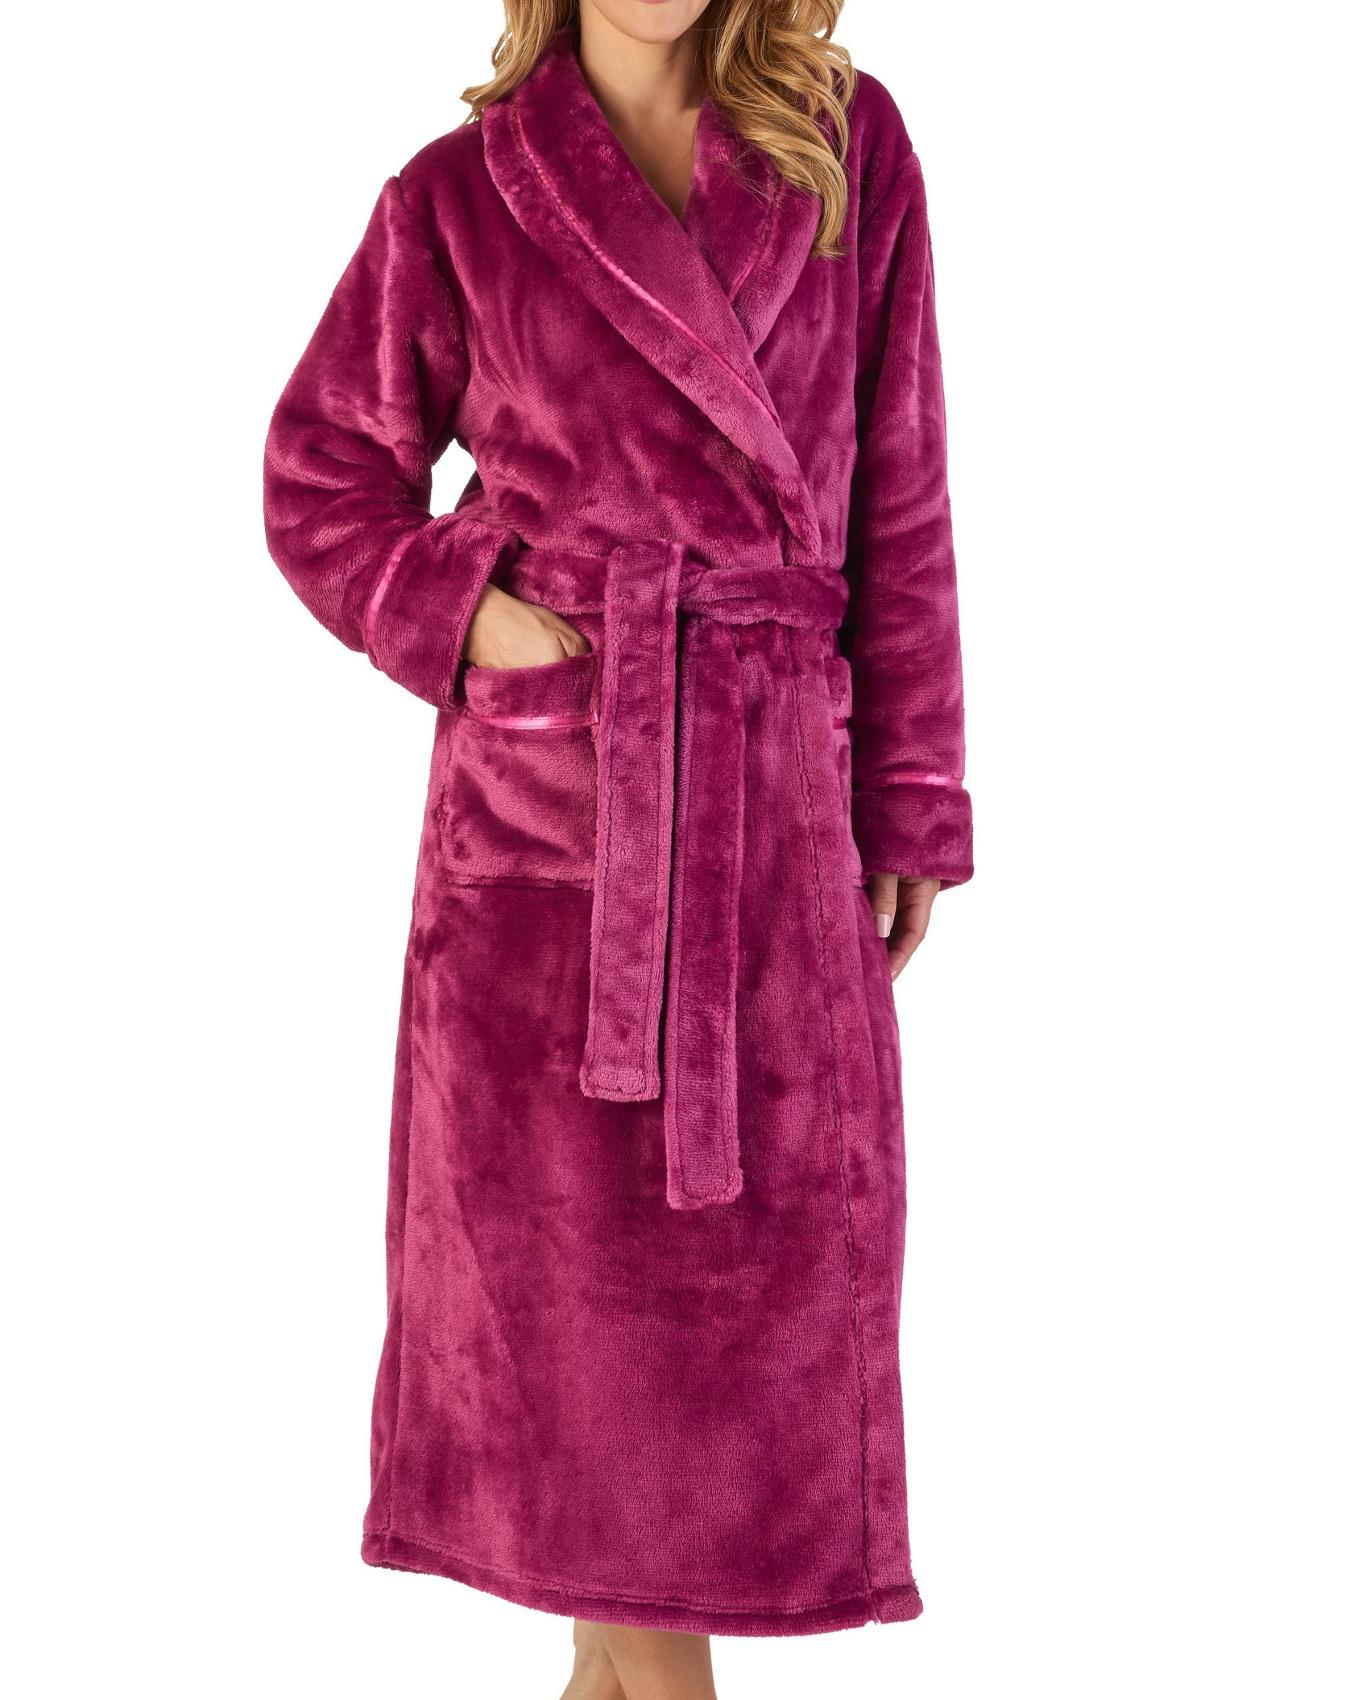 Slenderella Womens Luxury Thick Flannel Fleece Dressing Gown Shawl Collar Robe